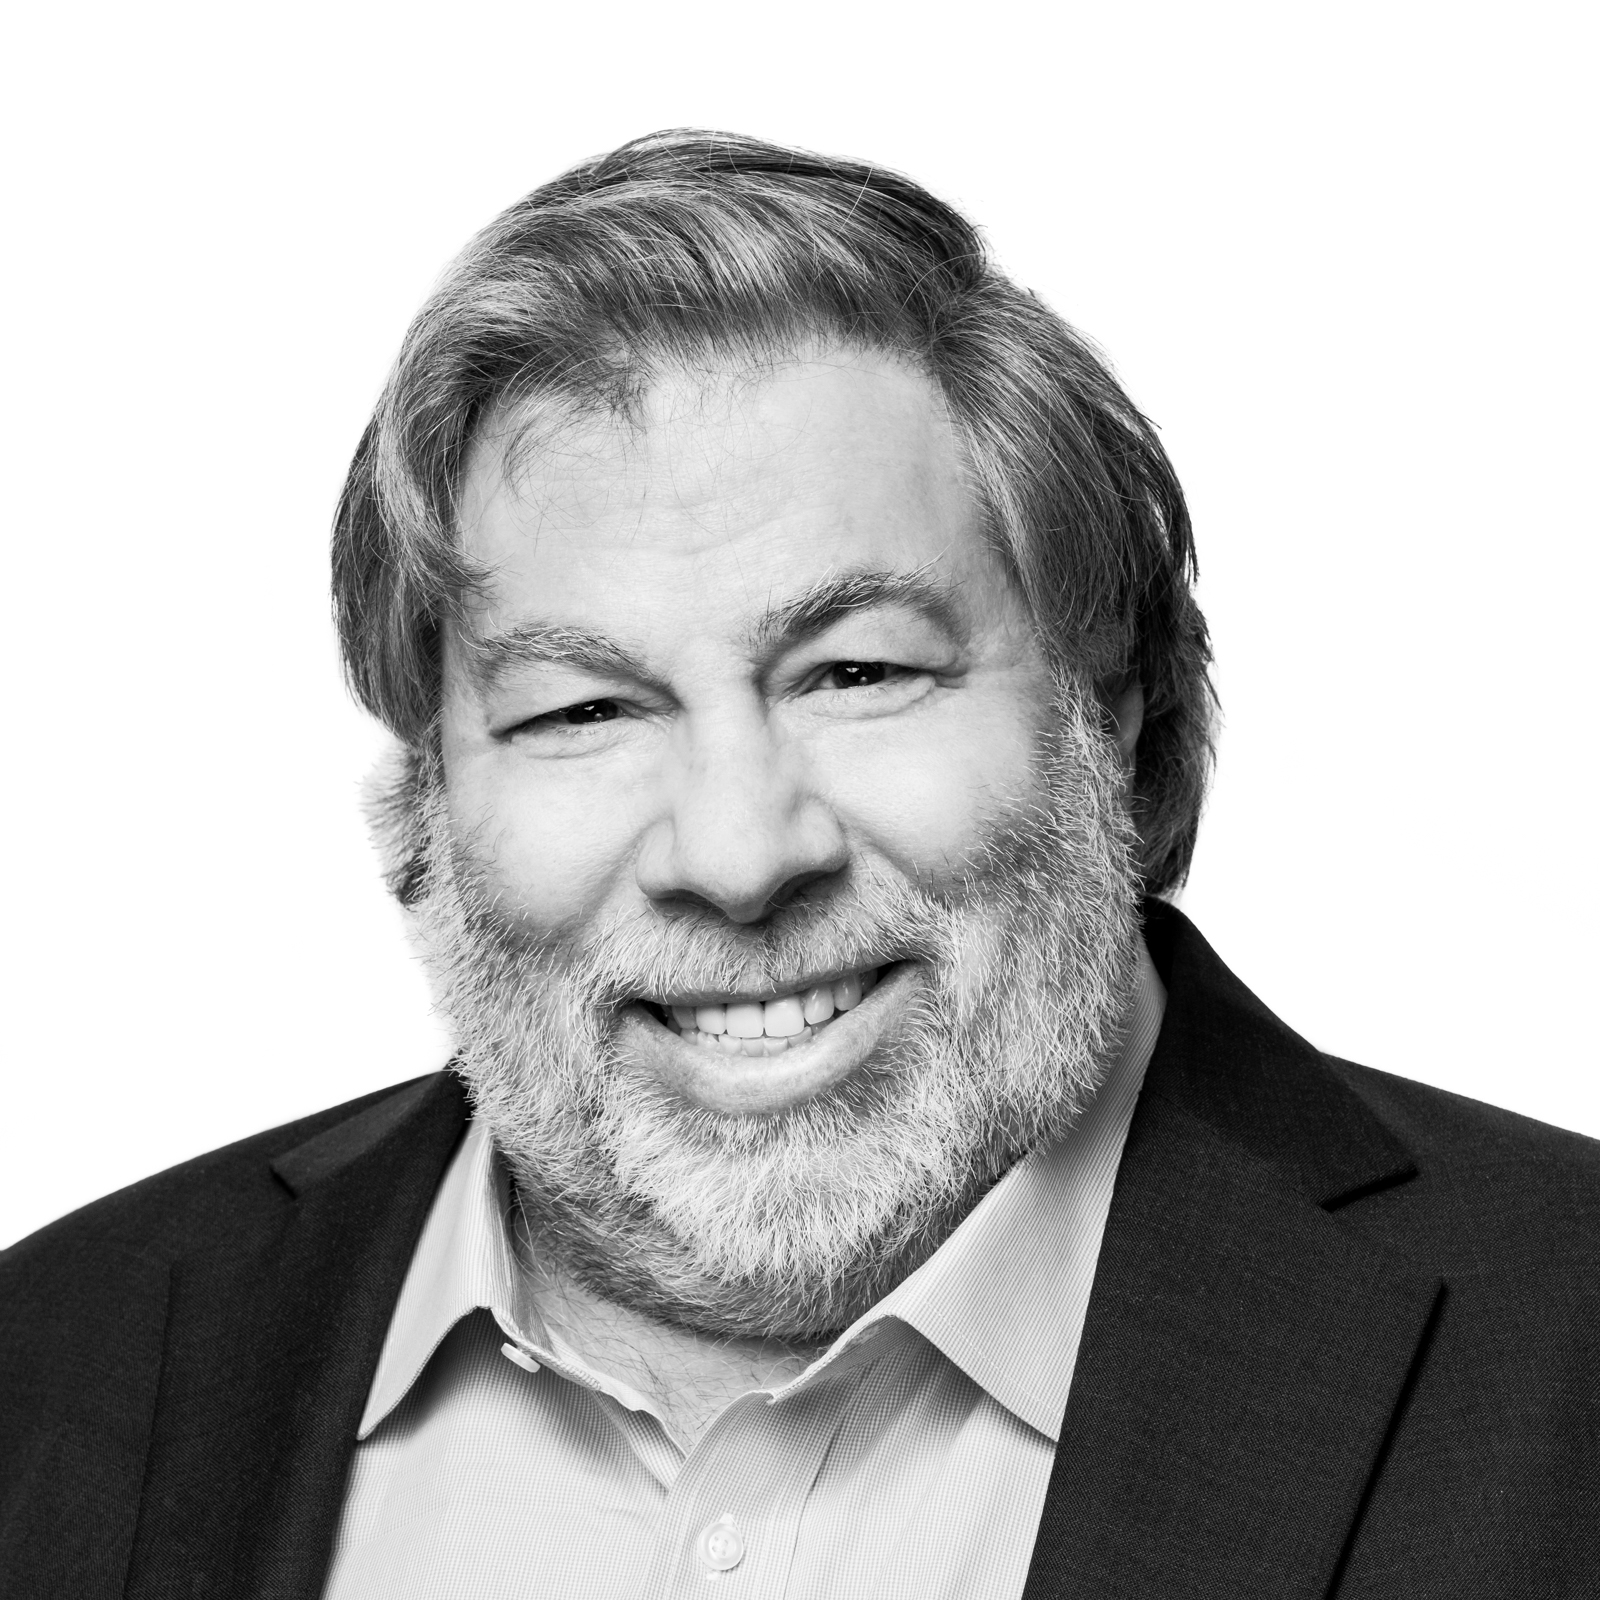 http://bdlaccelerate.com/2016/wp-content/uploads/2016/08/Steve-Wozniak-Image-by-Dan-Taylor-dan@heisenbergmedia.com-4.jpg